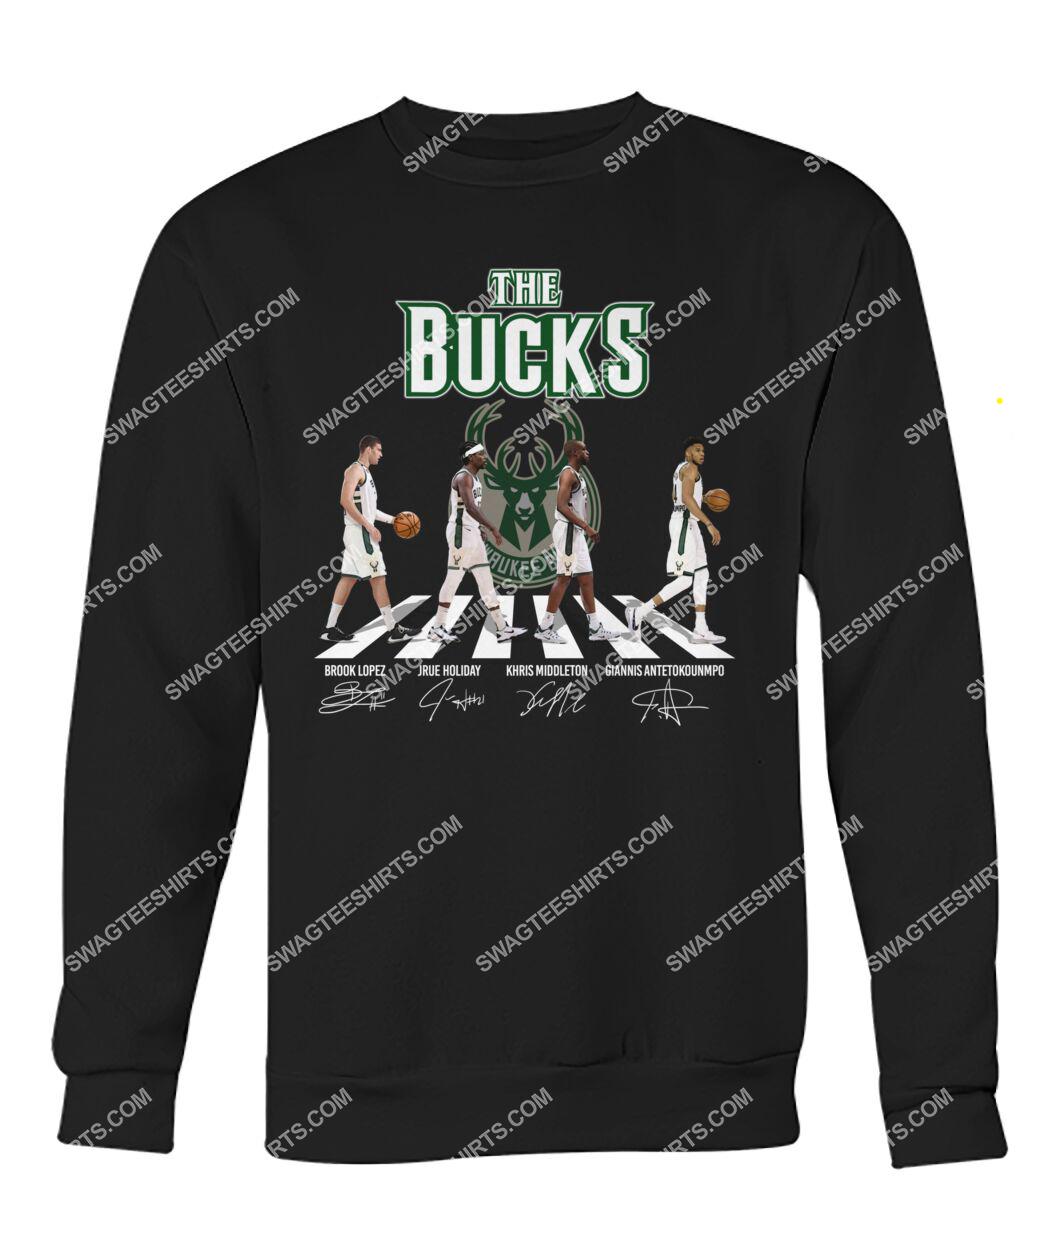 the milwaukee bucks walking abbey road sweatshirt 1